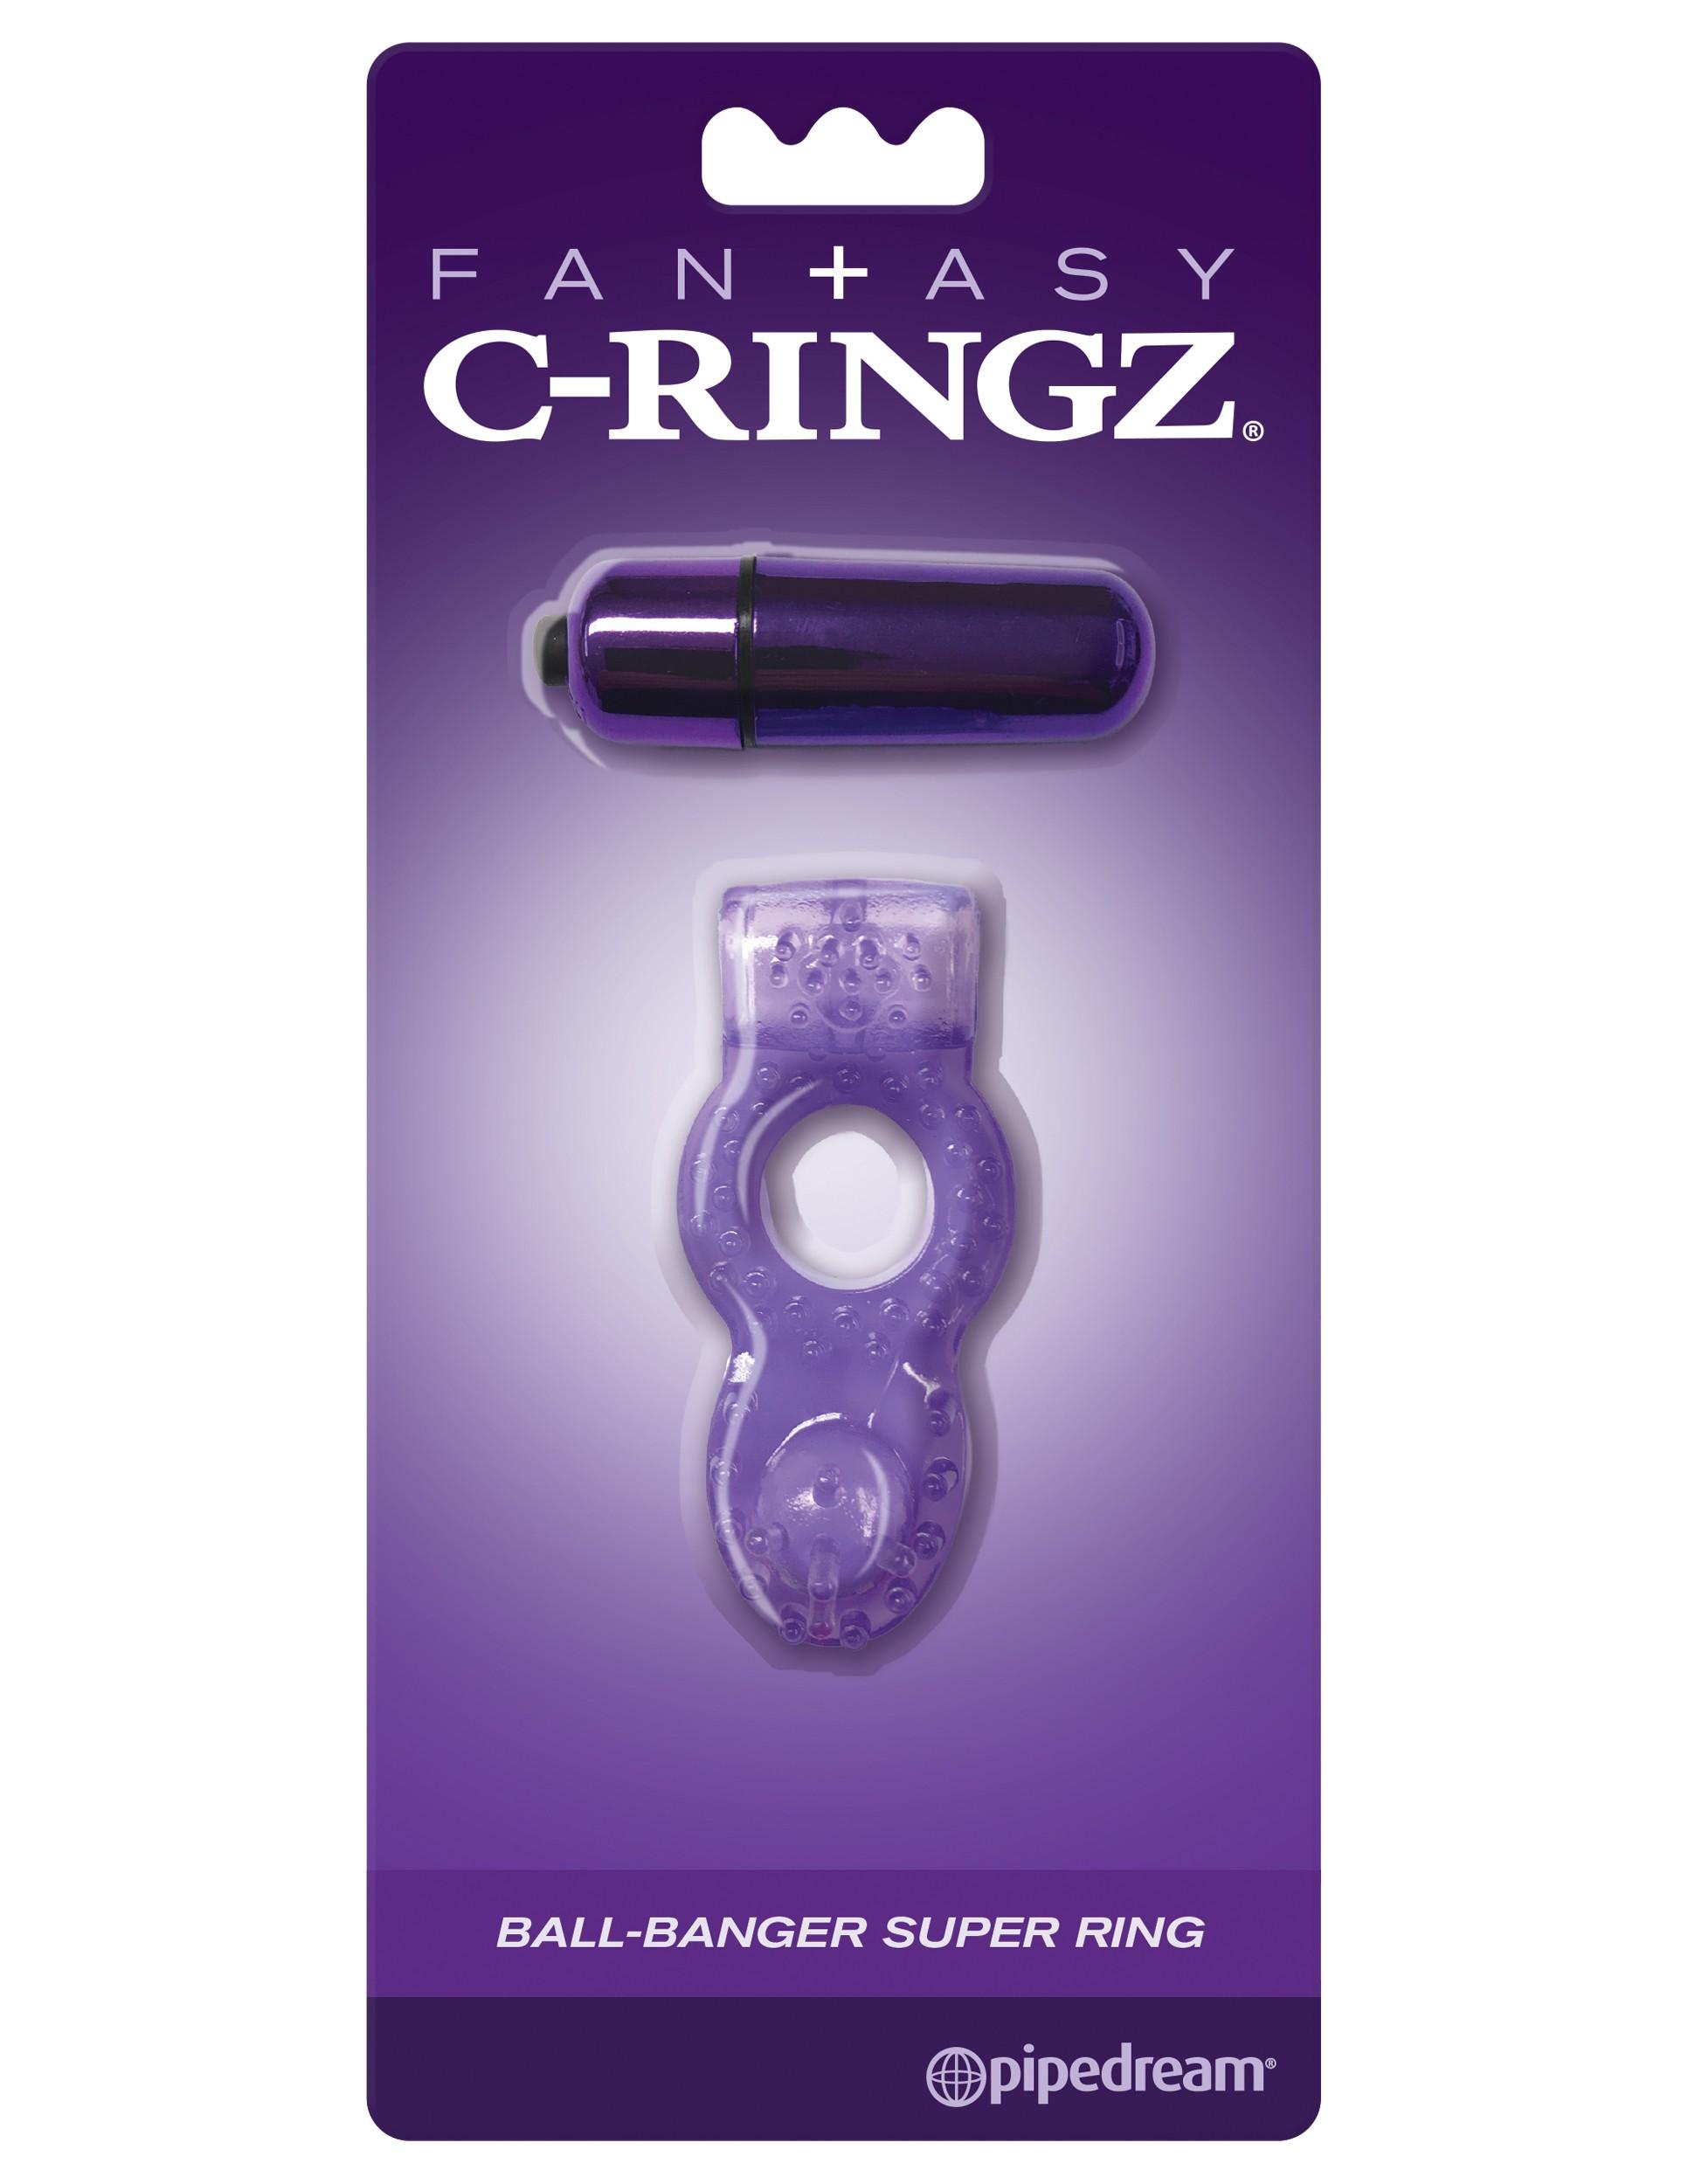 FANTASY C-RINGZ VIBRATING SILICONE